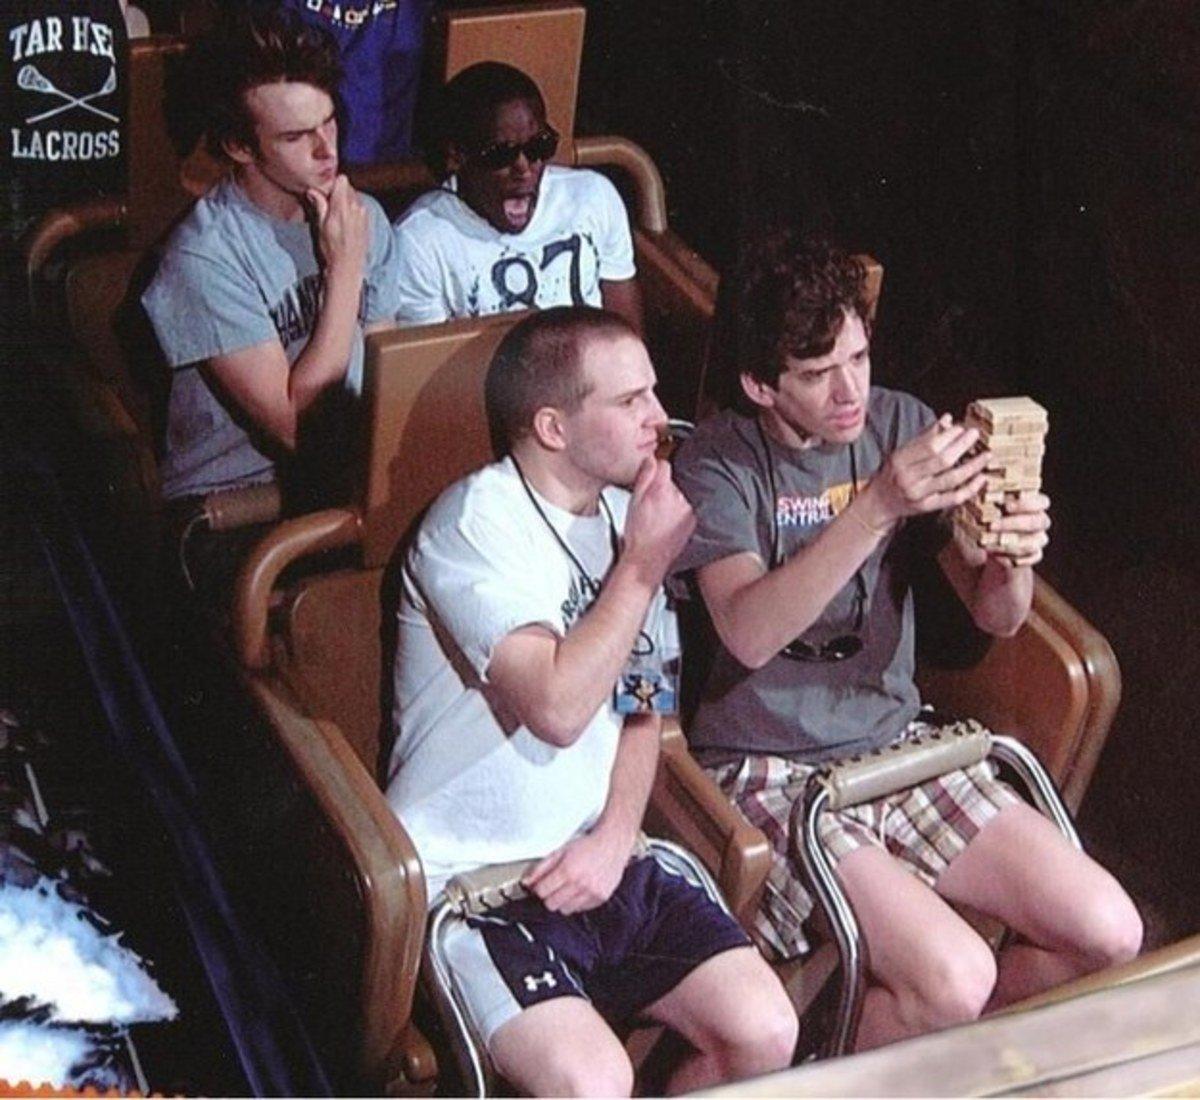 funny roller coaster photos jenga